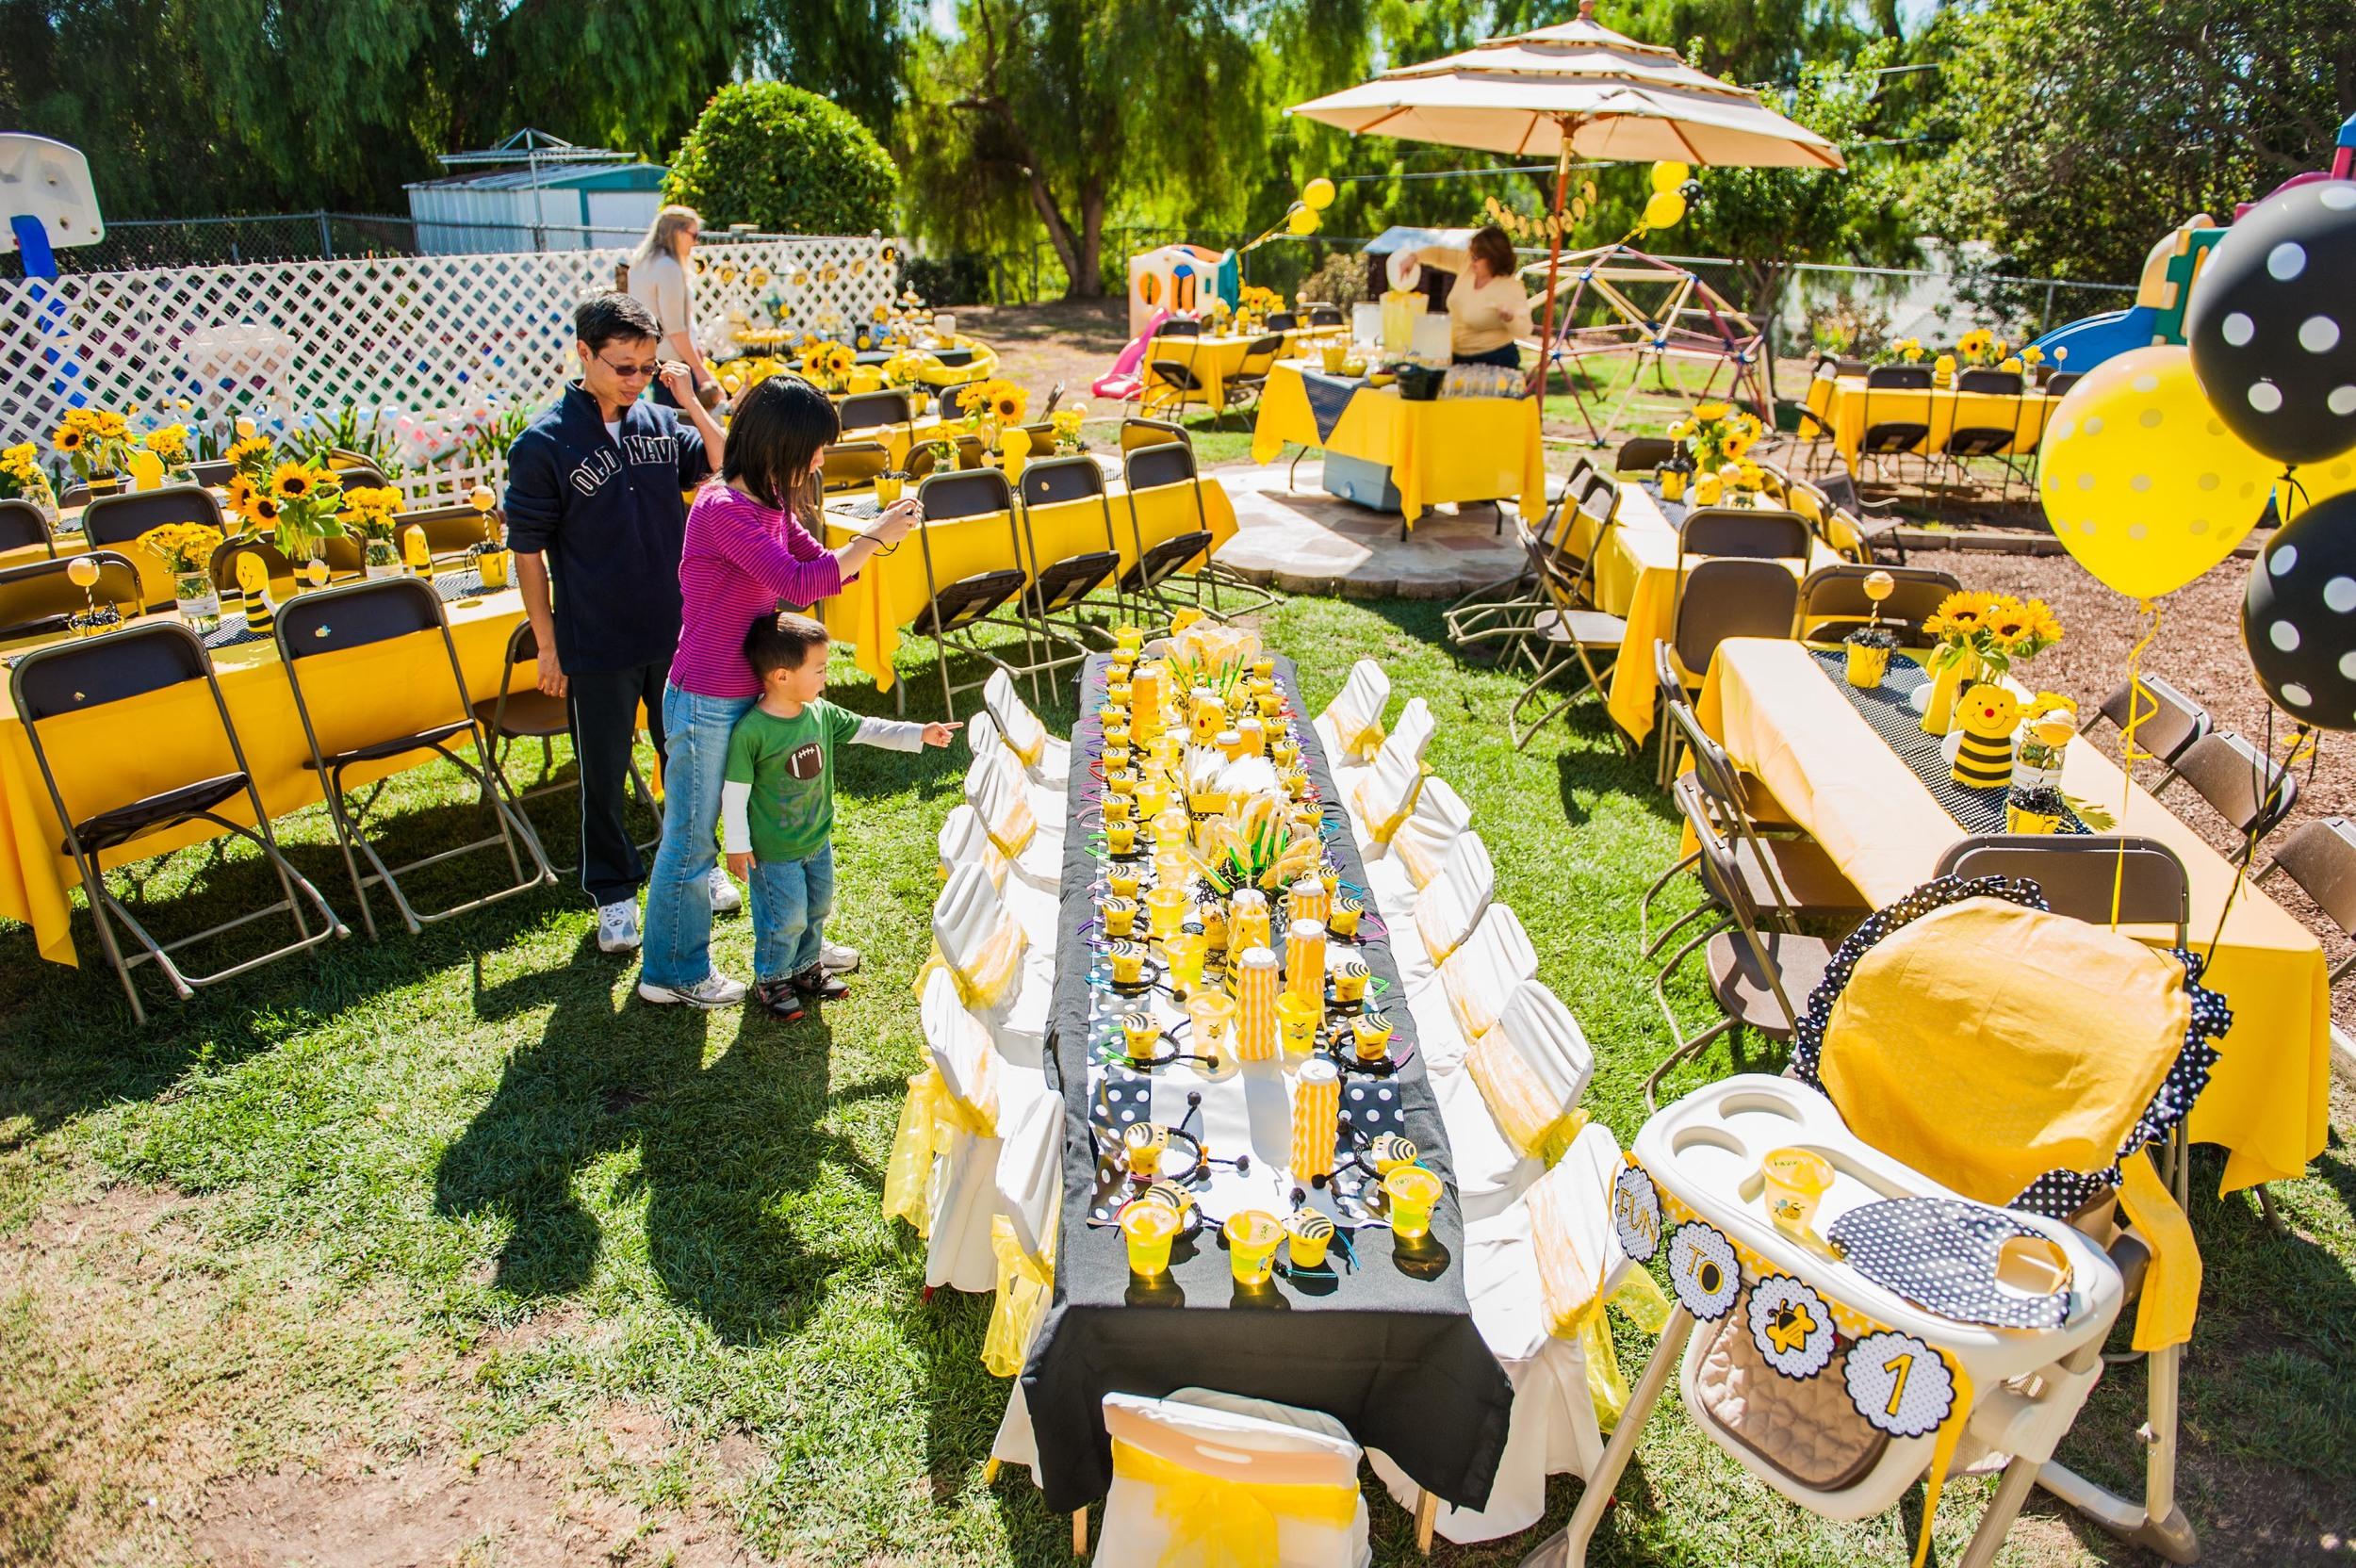 Fun to Bee One Kid's Table